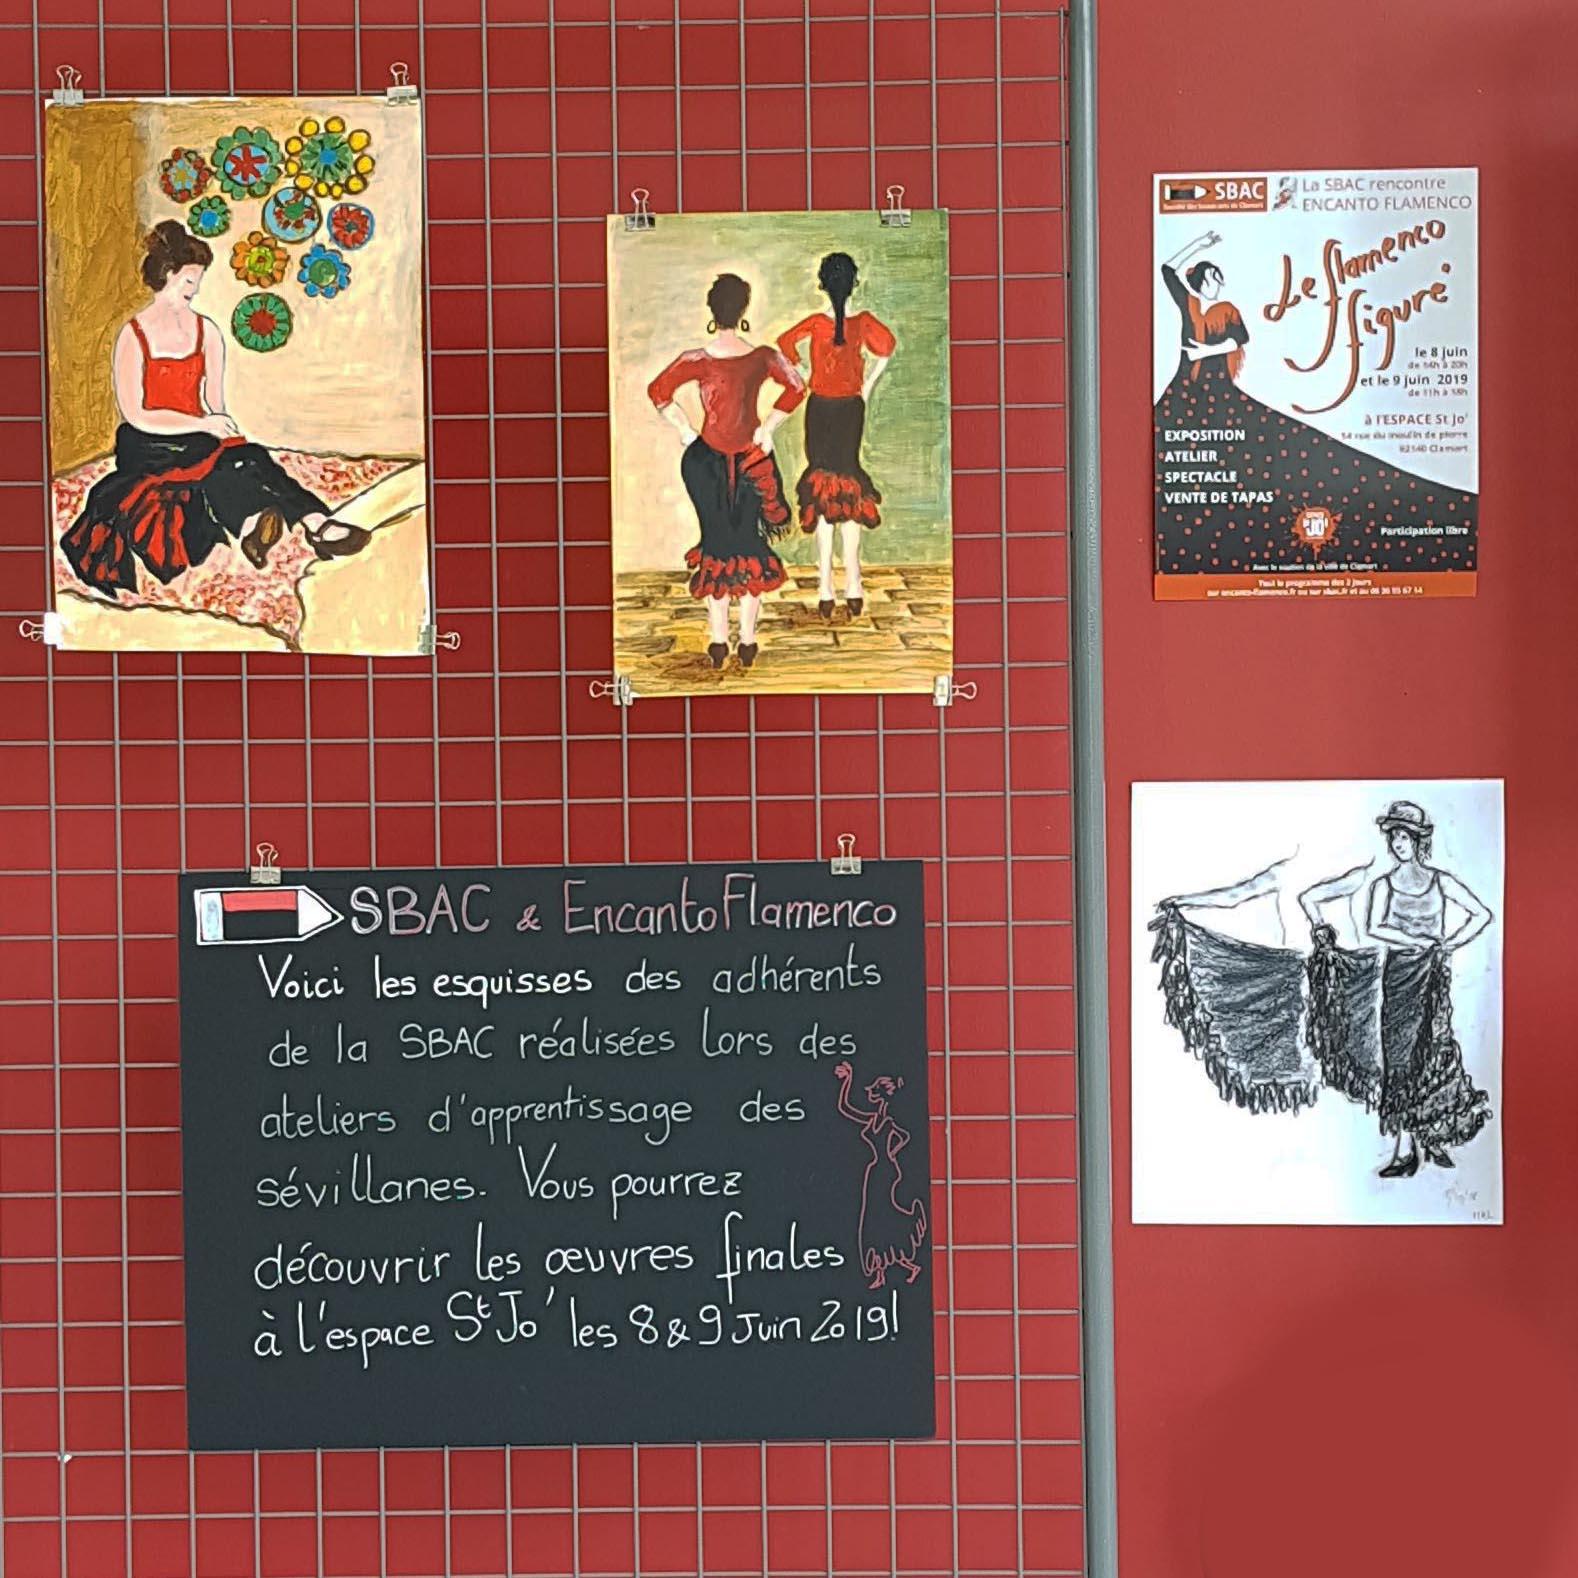 folies-danses_4_encanto-flamenco_sbacclamart_2019